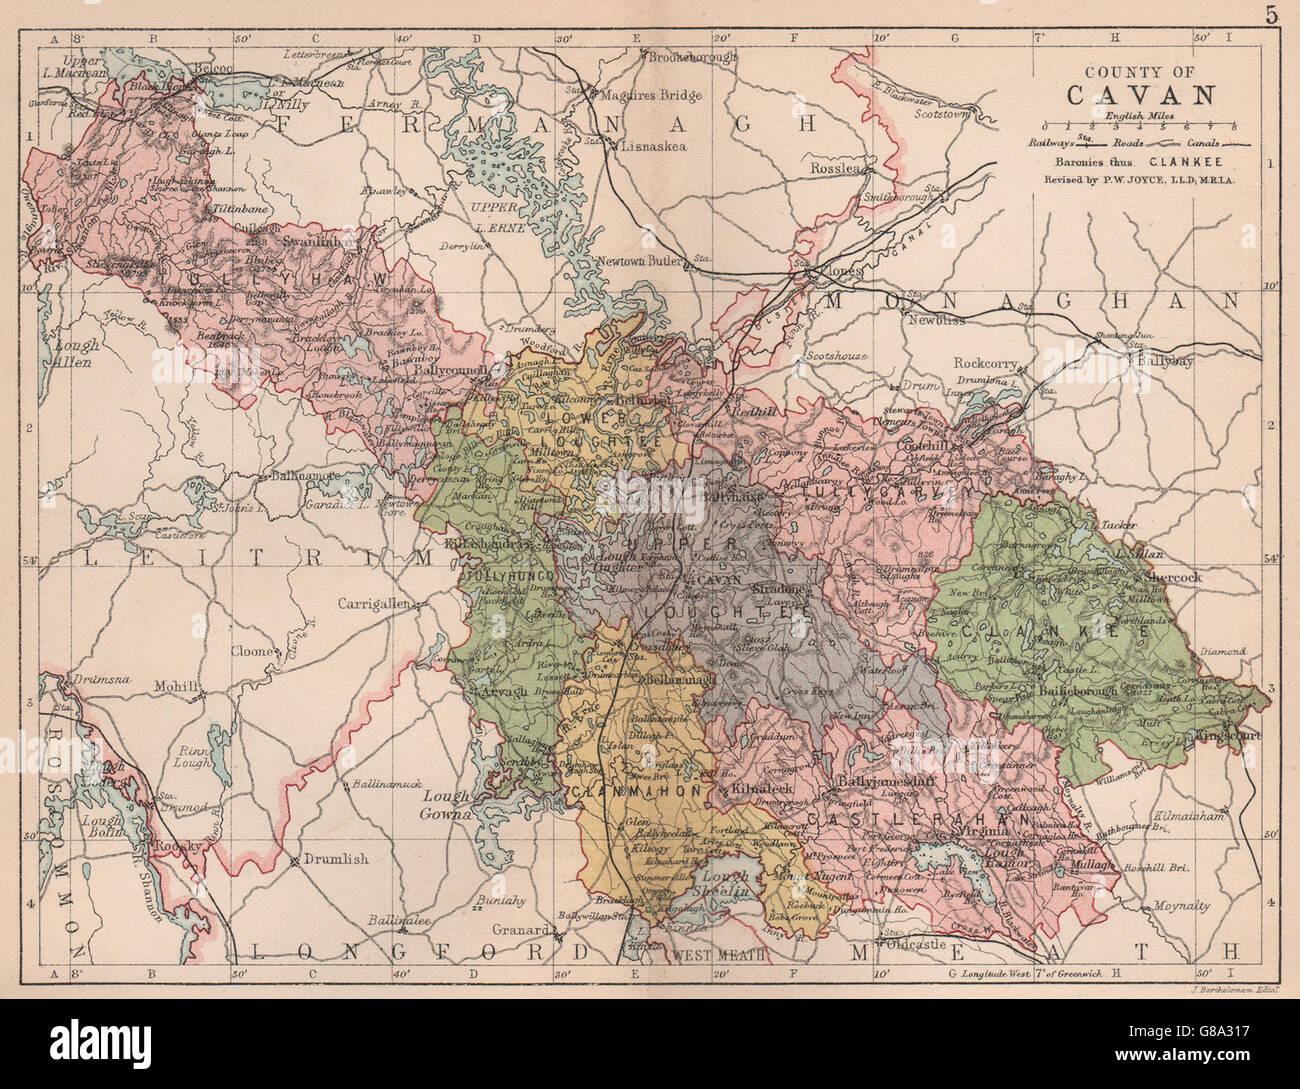 Map Of Ireland Cavan.County Cavan Antique County Map Ulster Ireland Bartholomew 1882